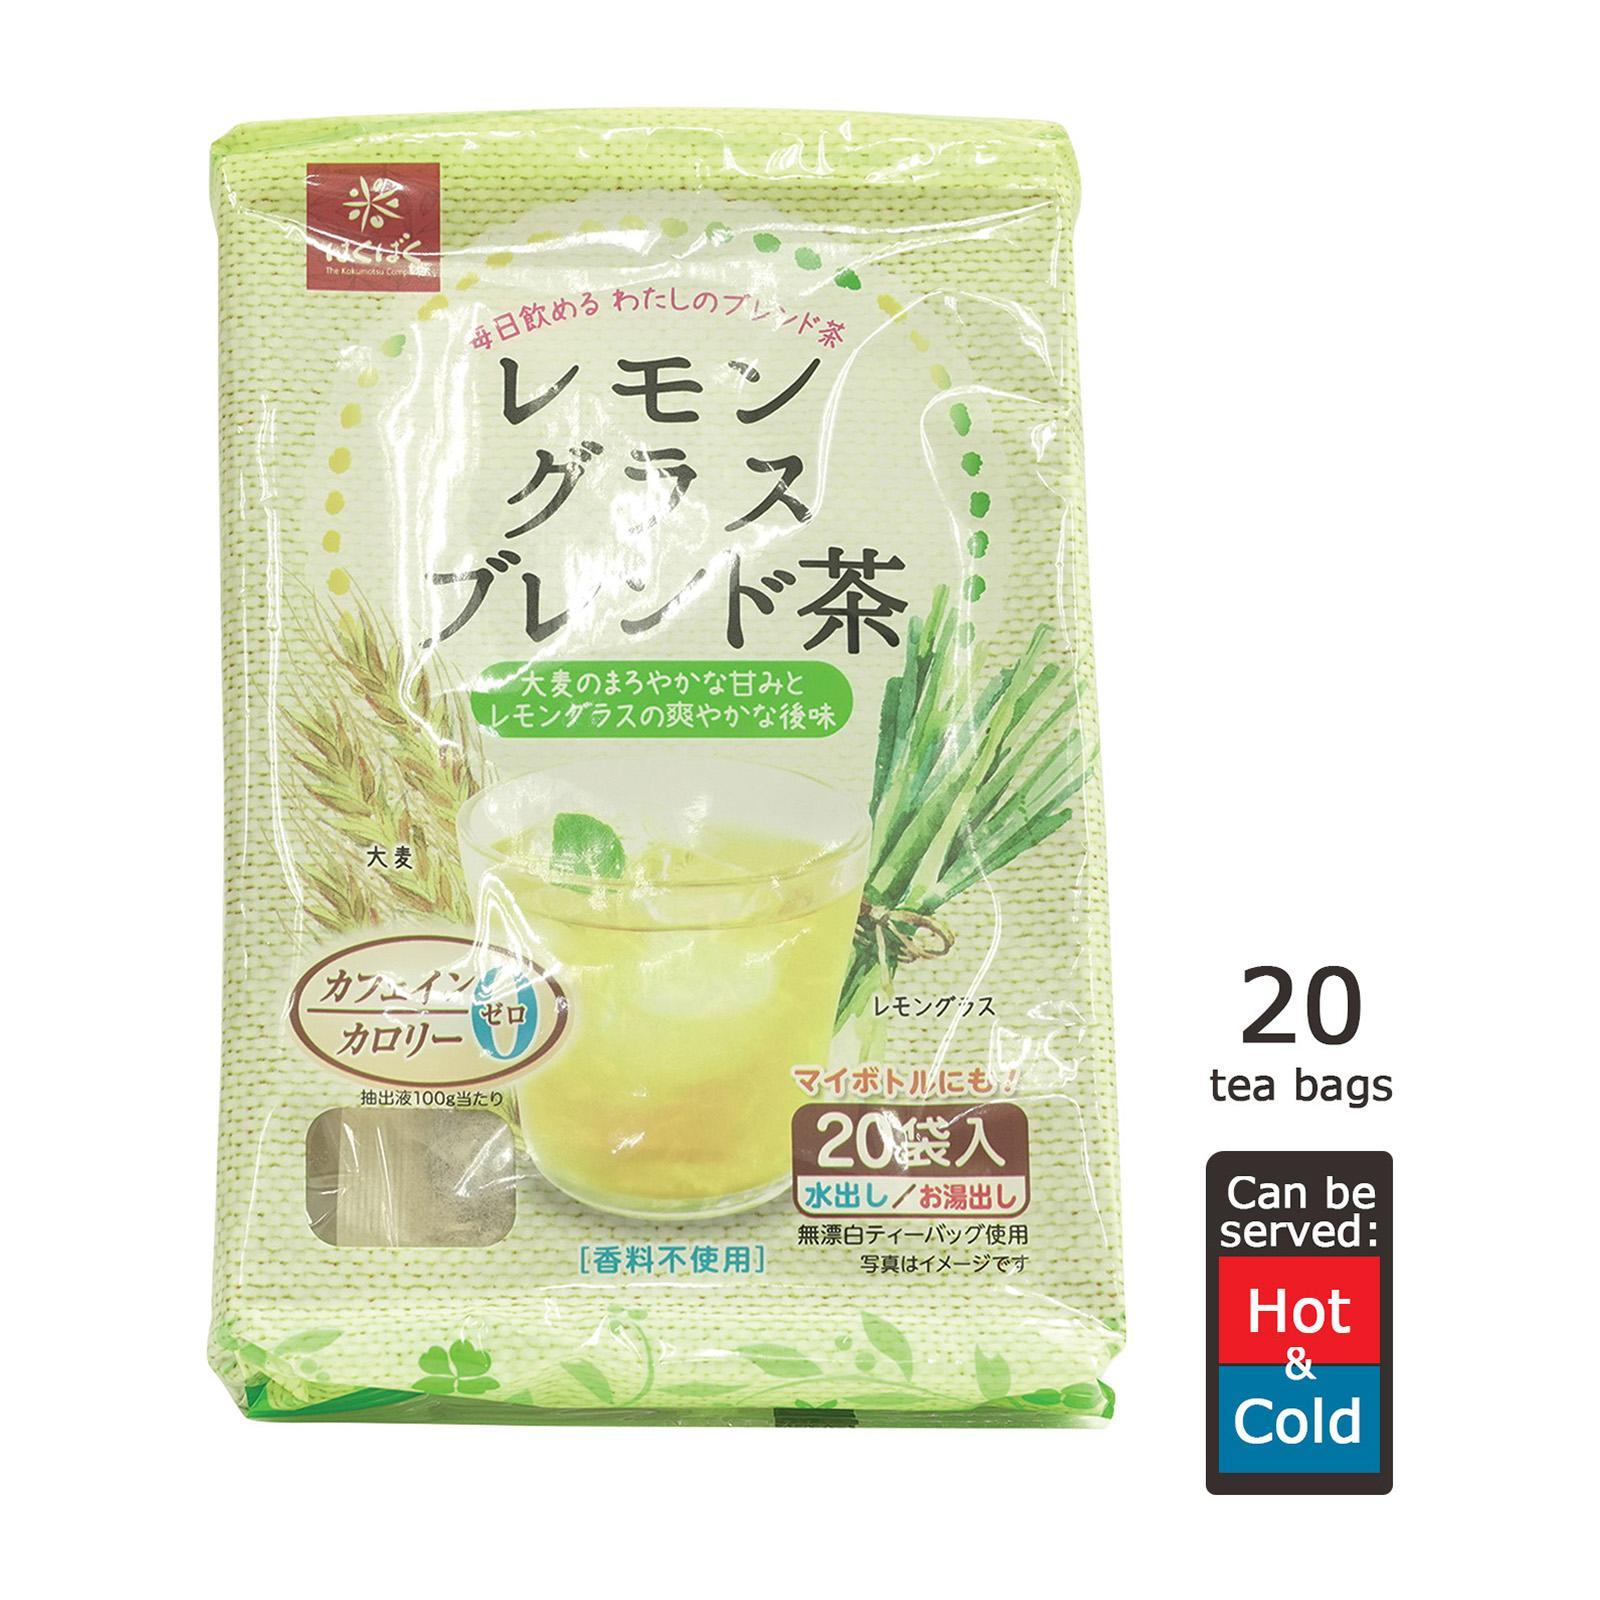 Hakubaku Barley Tea - Lemongrass 20s (140g) Tea